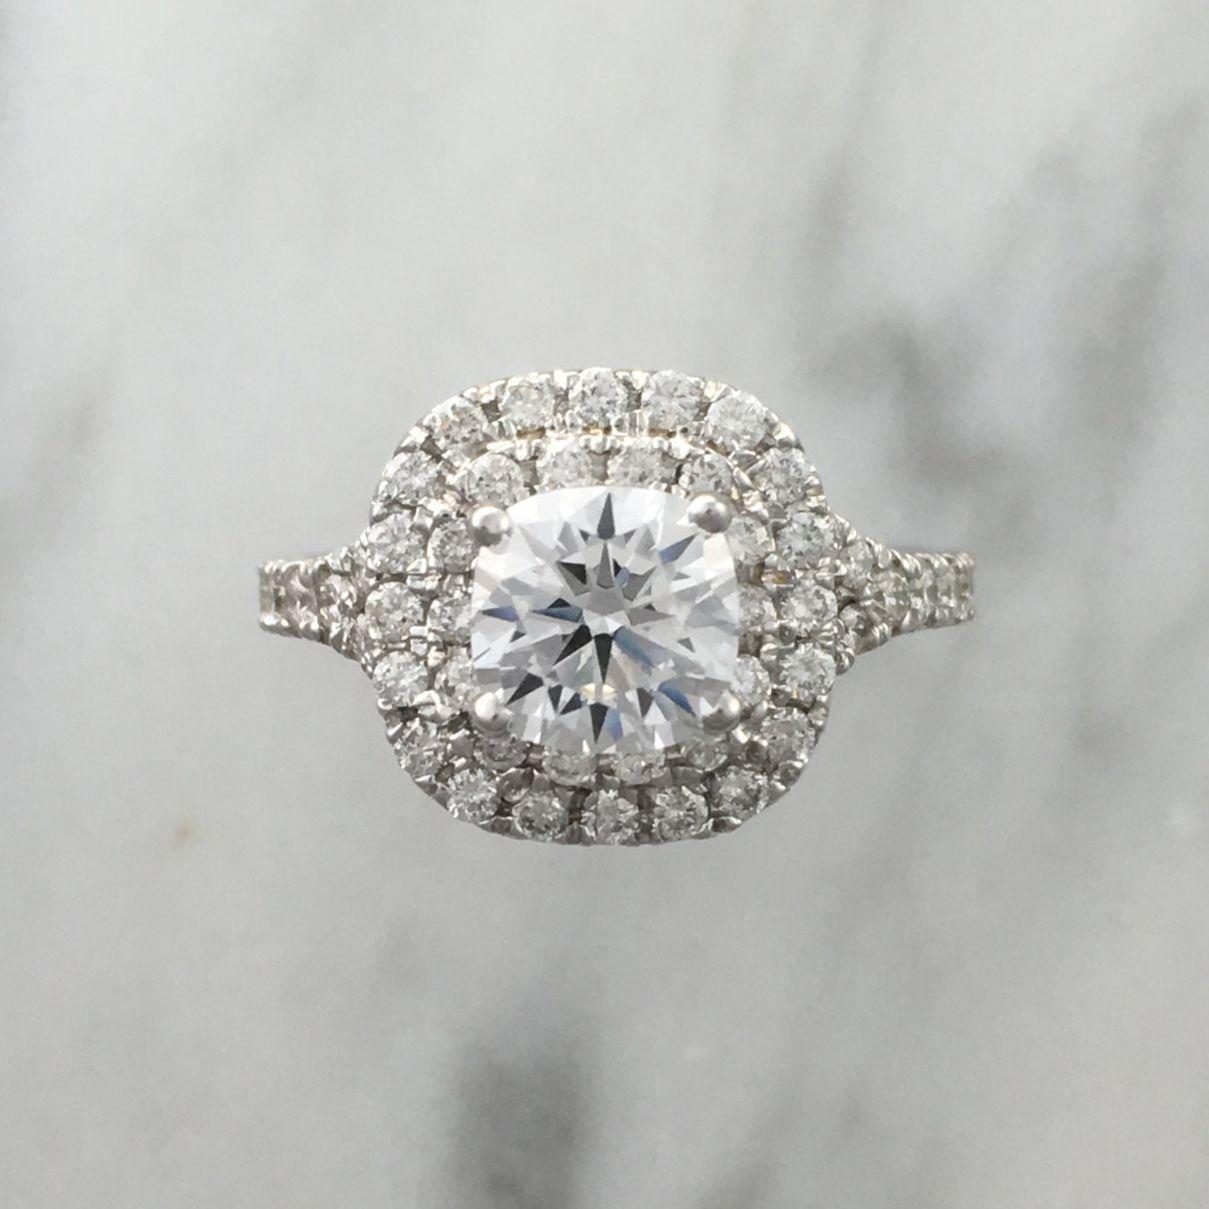 joanna gaines engagement ring - double cushion platinum diamond engagement ring